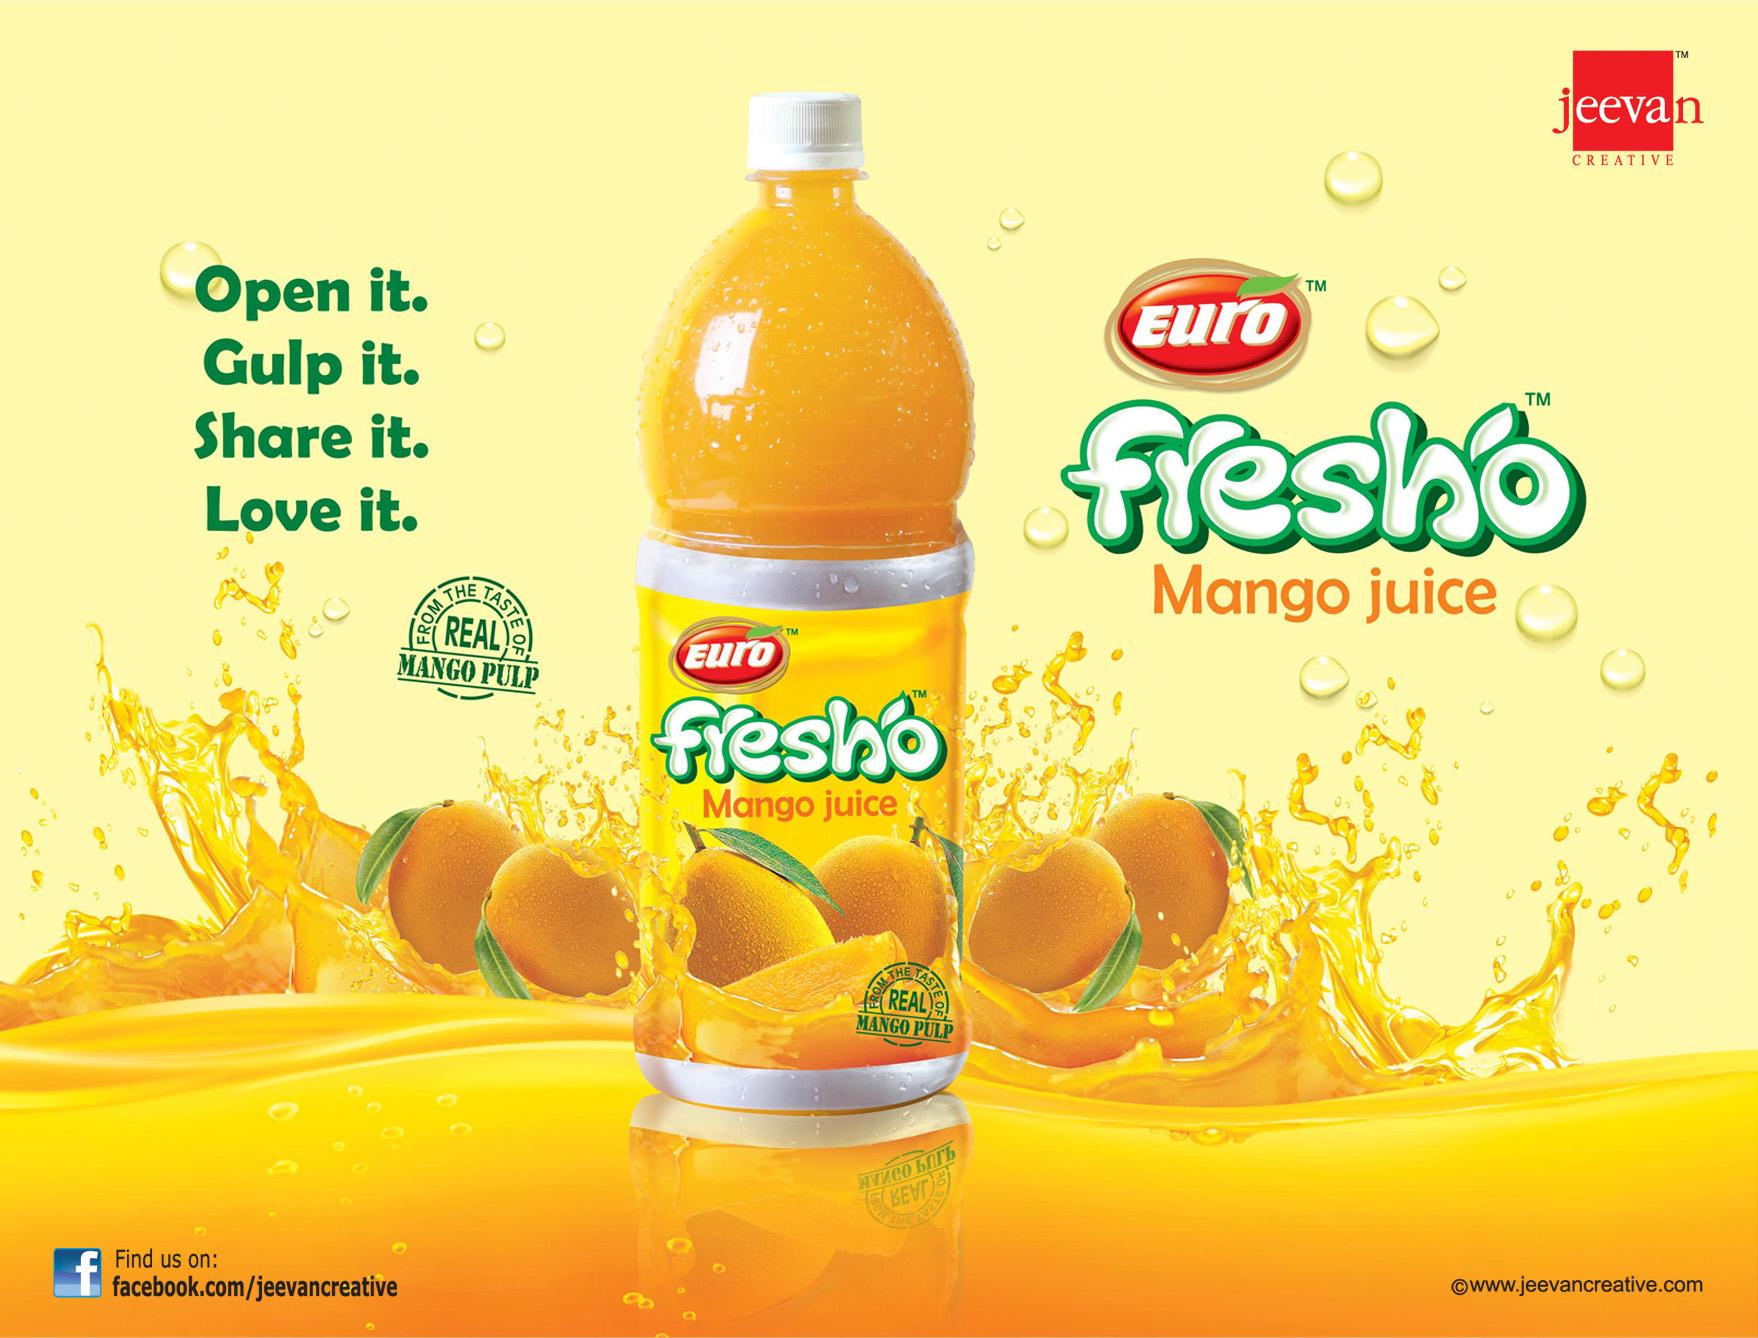 Euro Fresho Mango Juice by jeevancreative